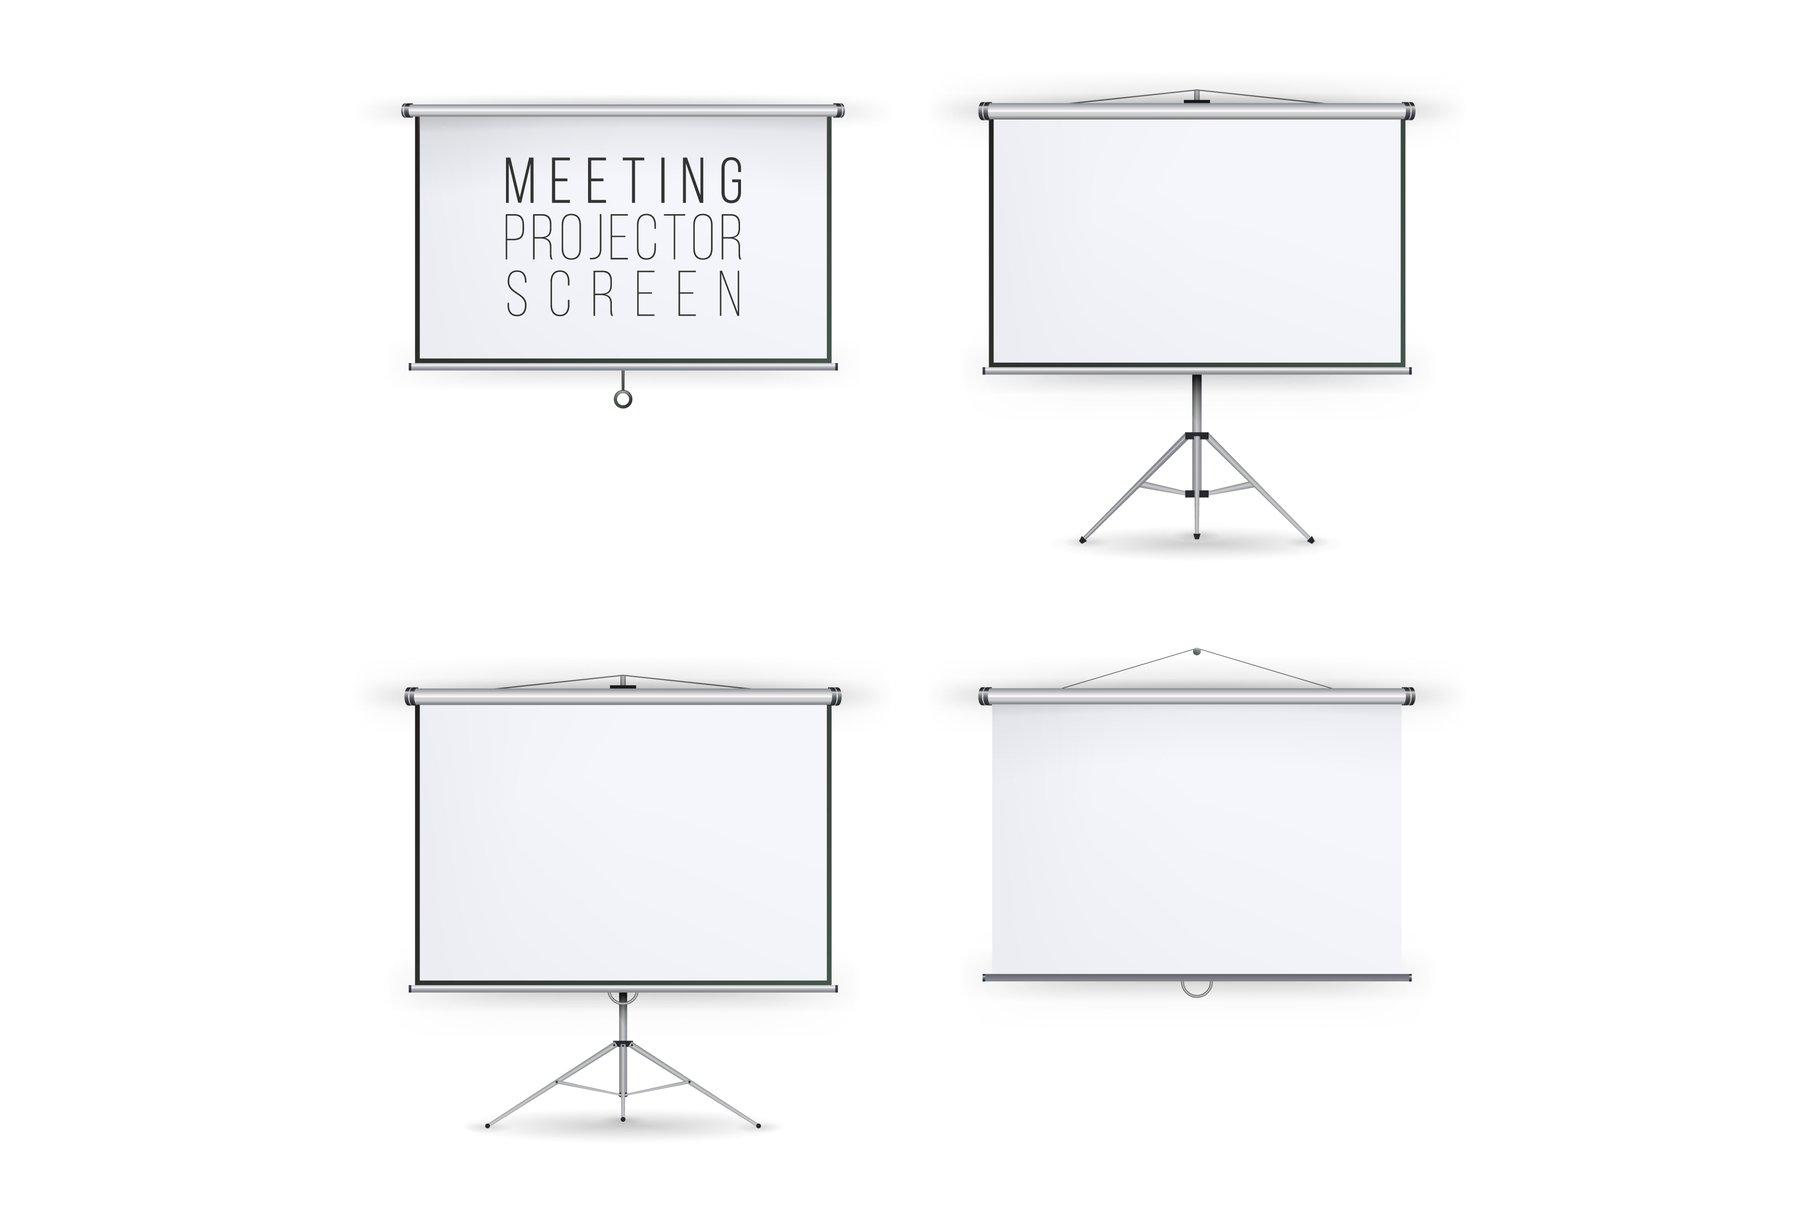 Meeting Projector Screen Vector Set example image 1